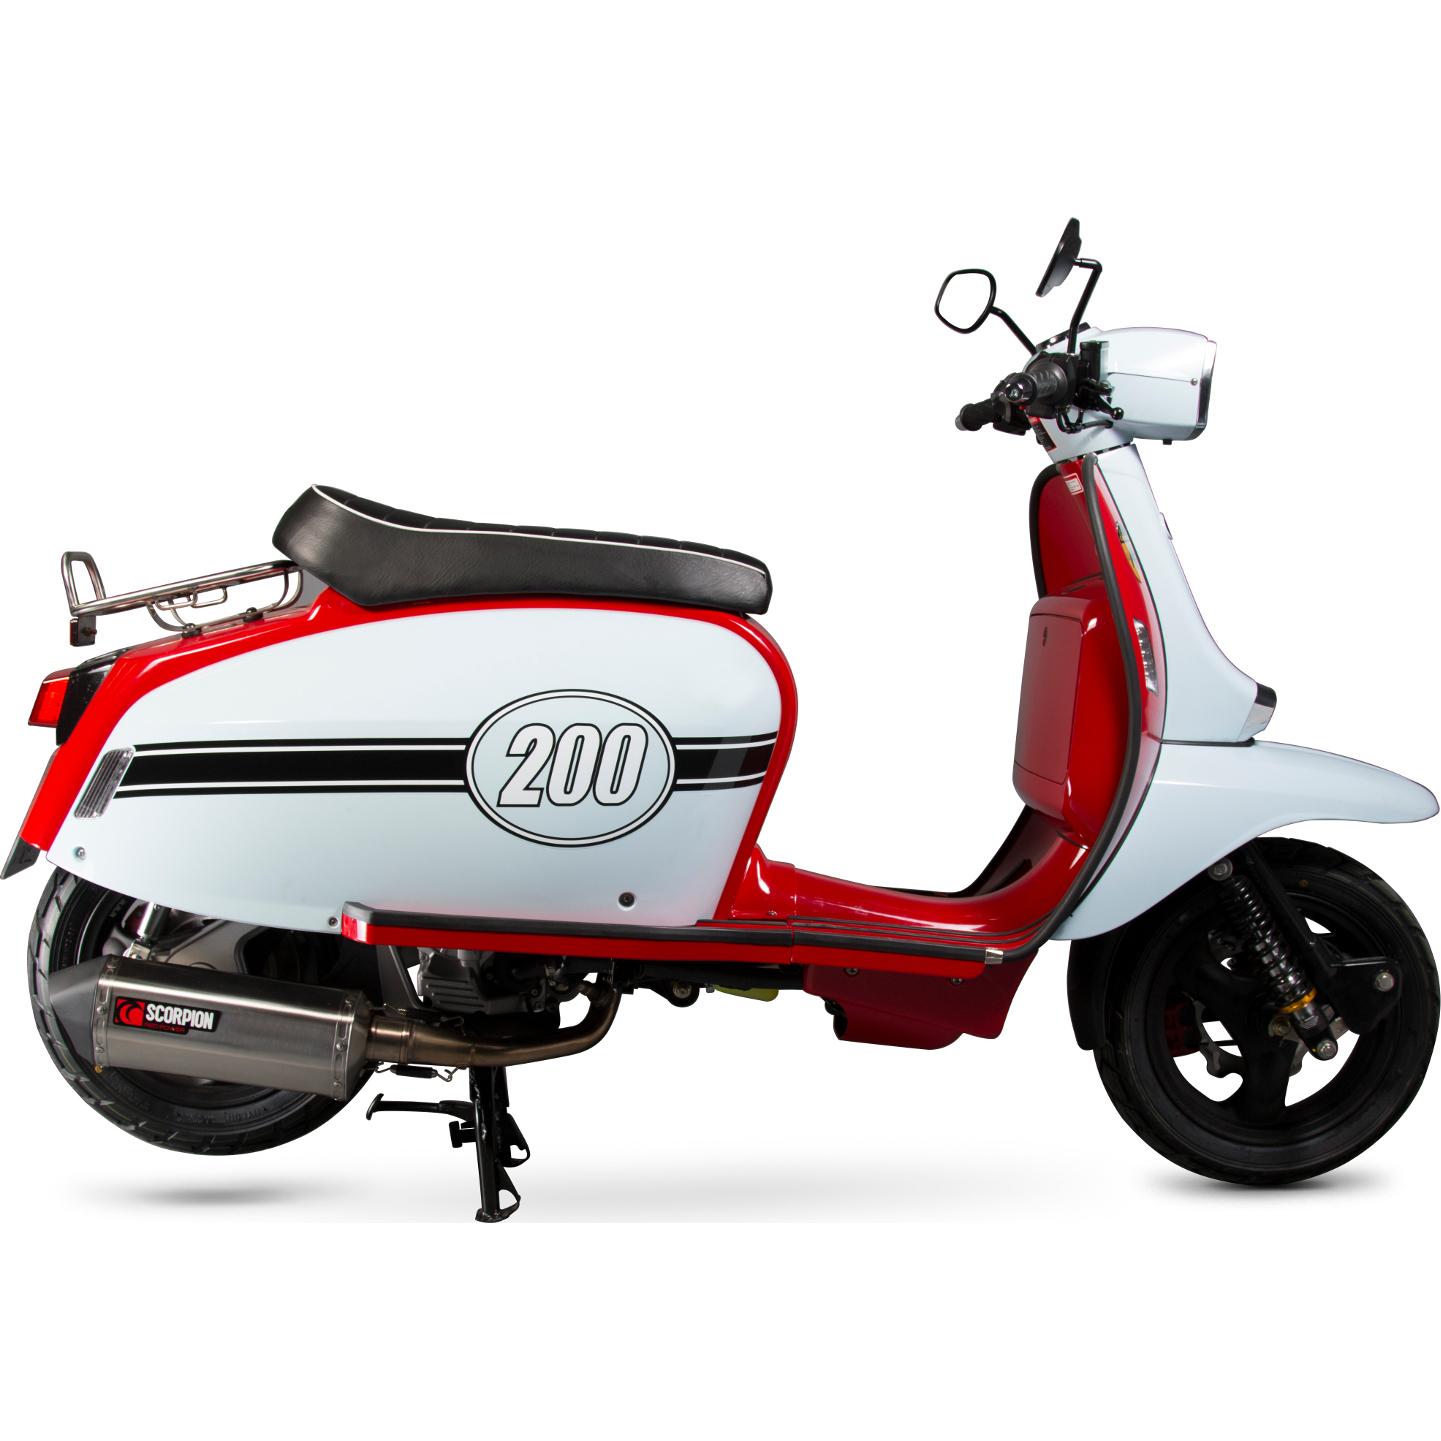 Scomadi Tl 200 2016 17 Scorpion Serket Parallel Stainless Moped